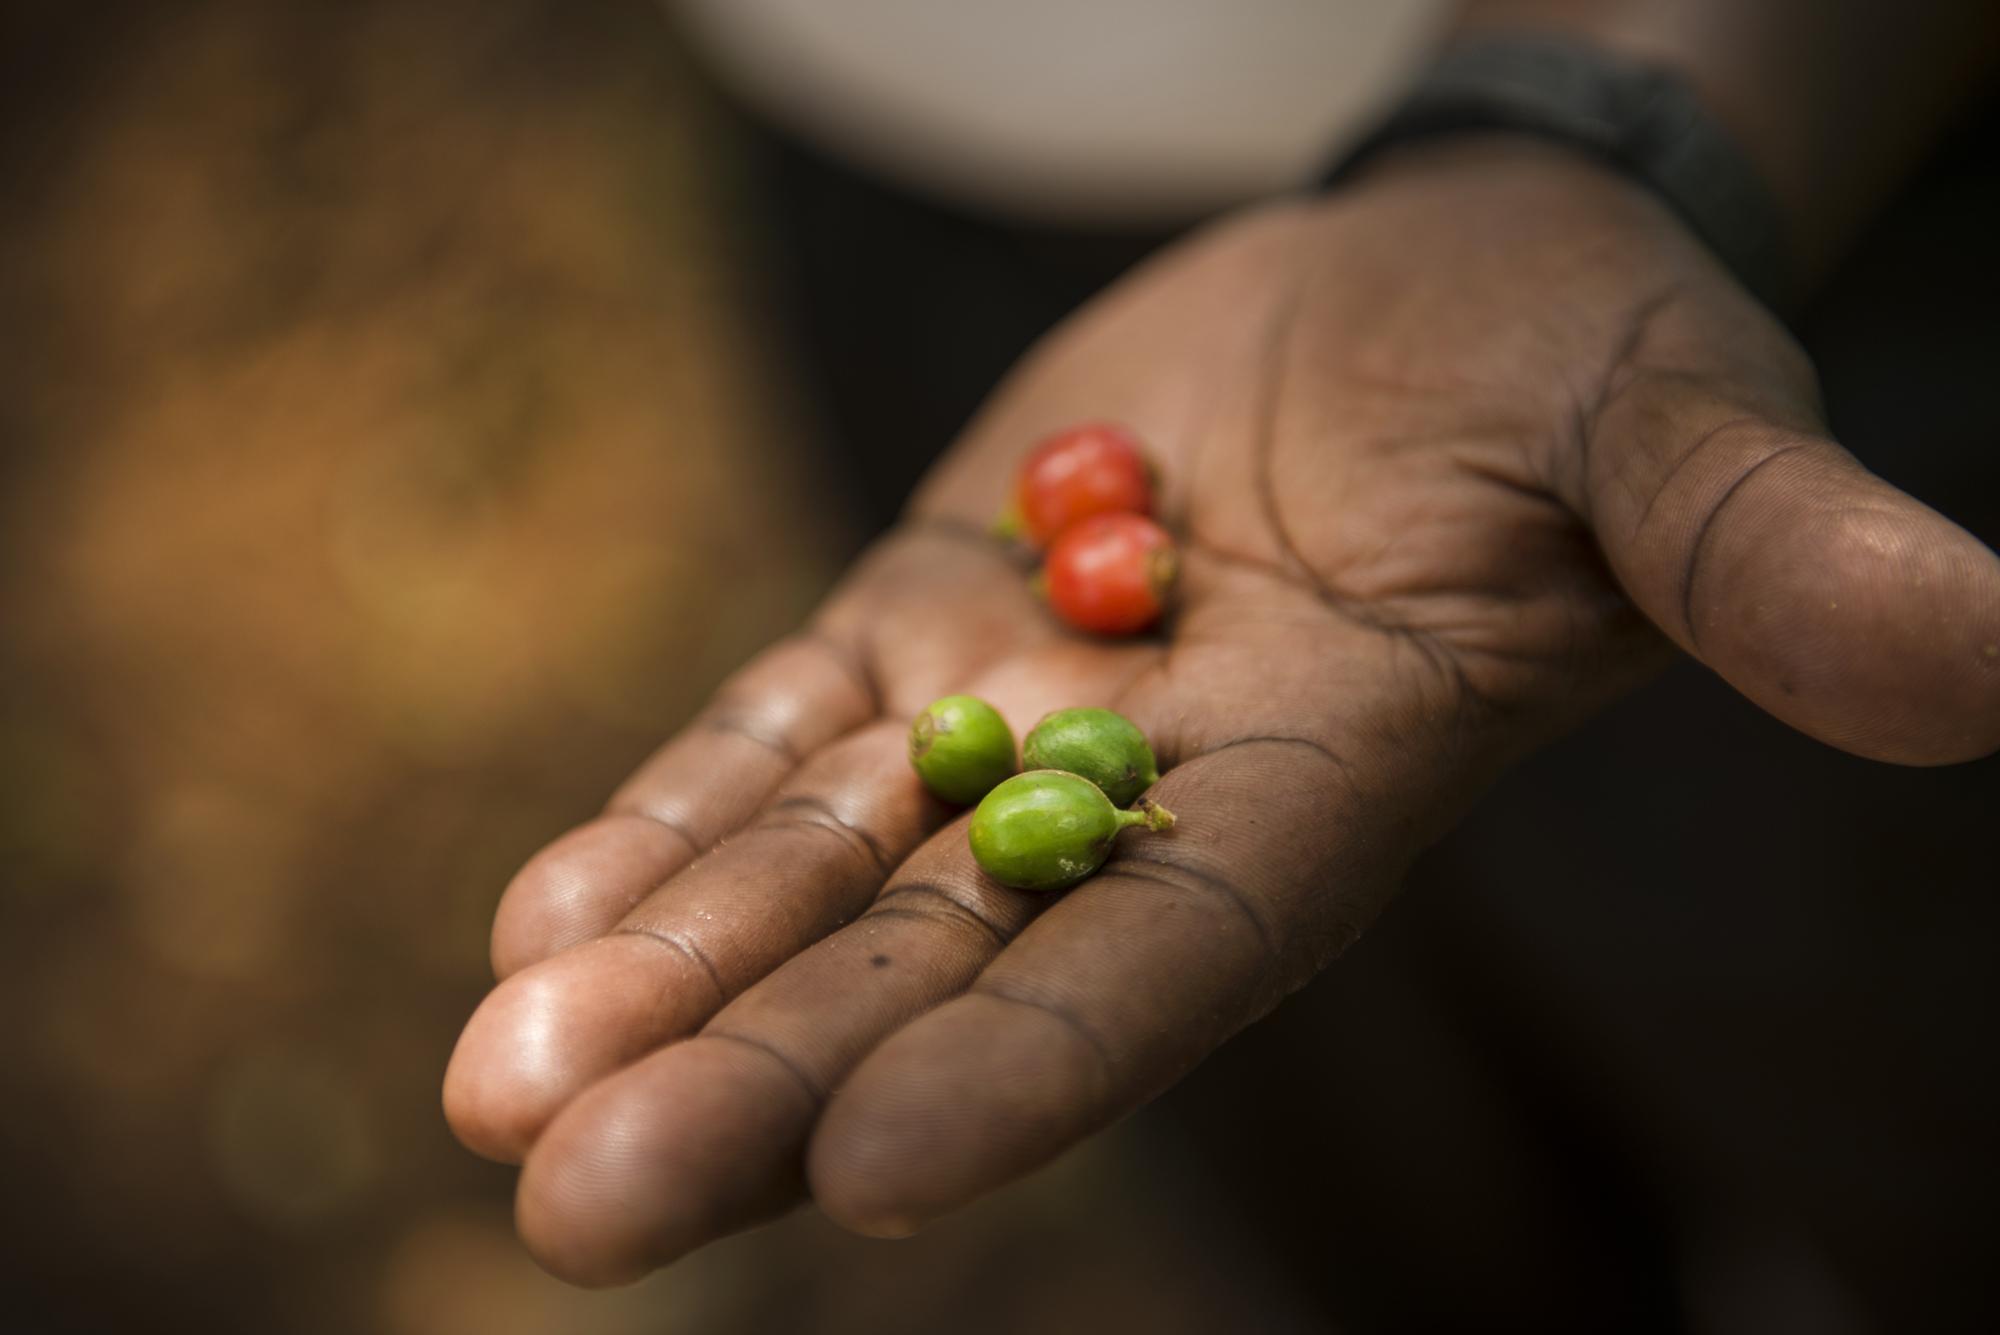 pepper in hand.jpg